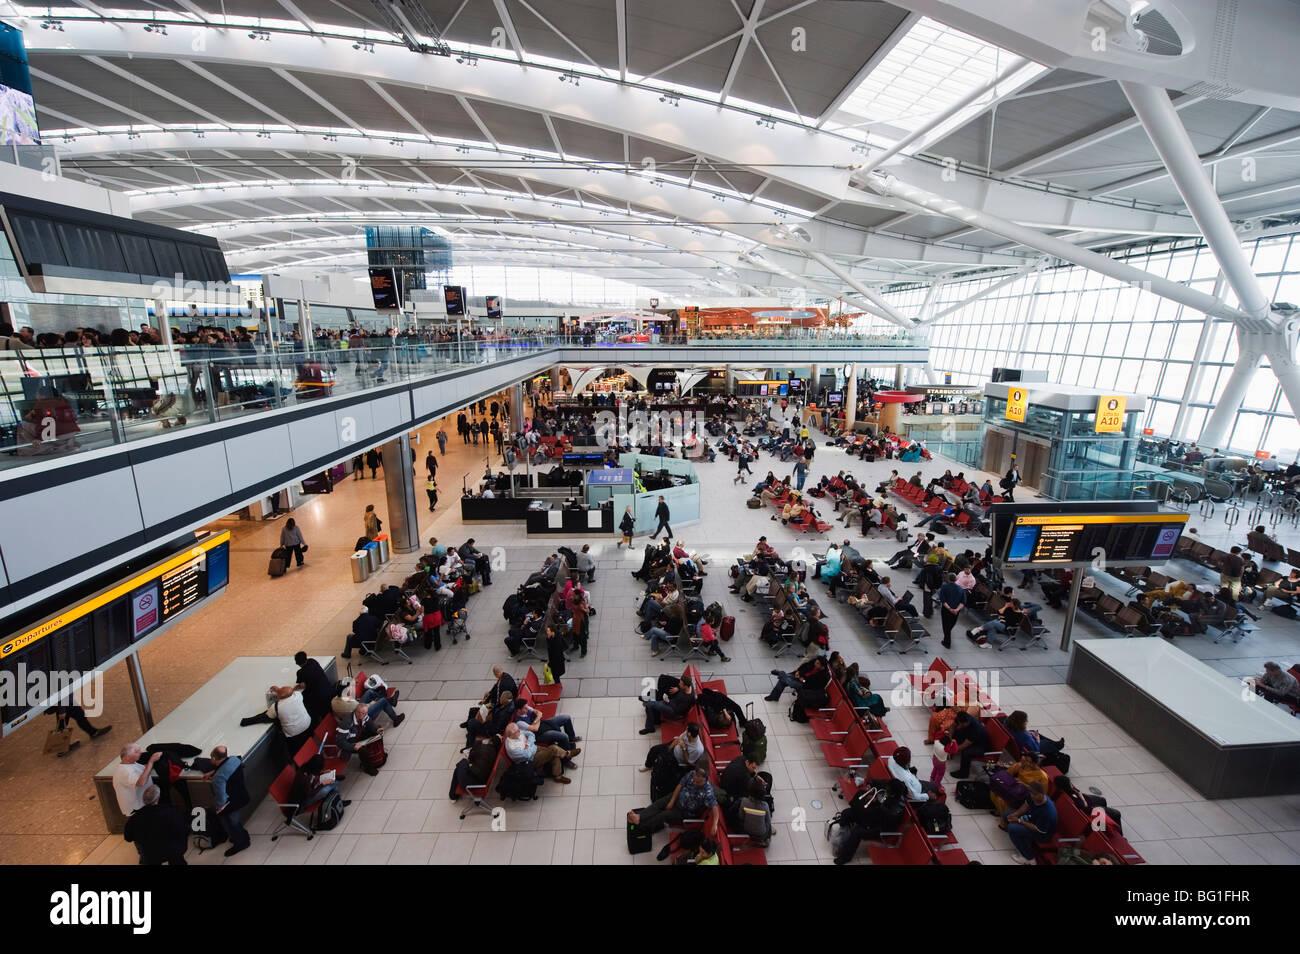 Heathrow Airport, Terminal 5, London, England, United Kingdom, Europe - Stock Image